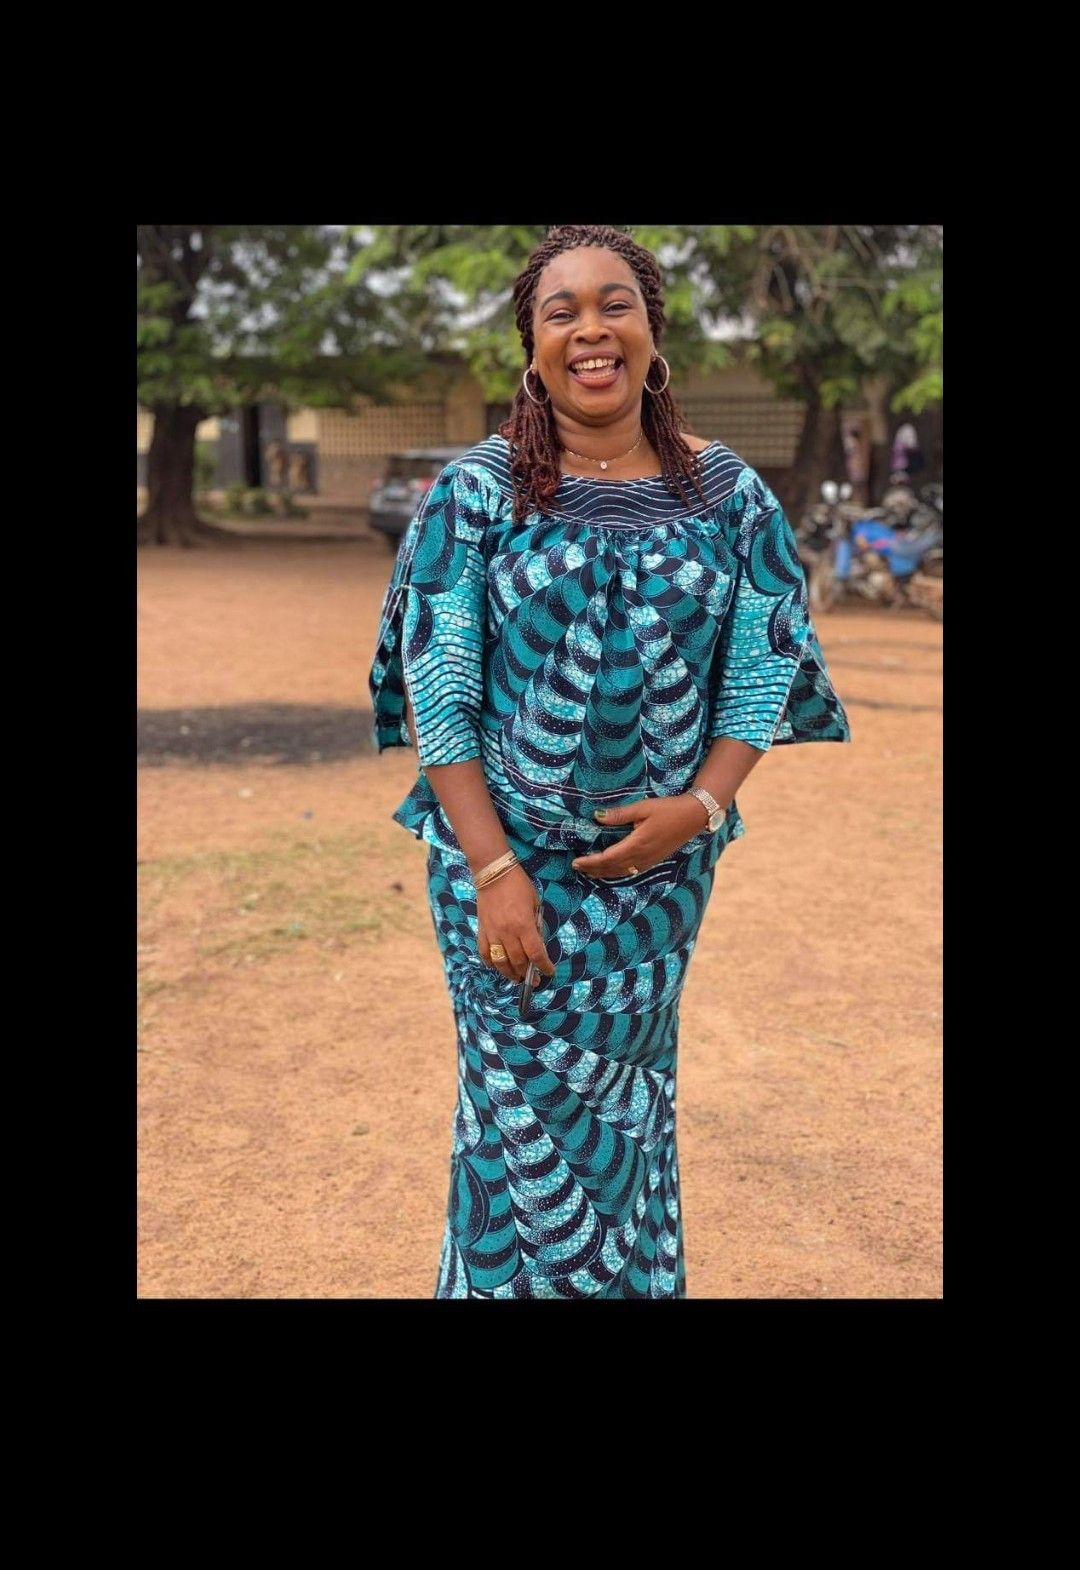 Pin by Towé Deniz on Tenue africaine   African design dresses ...